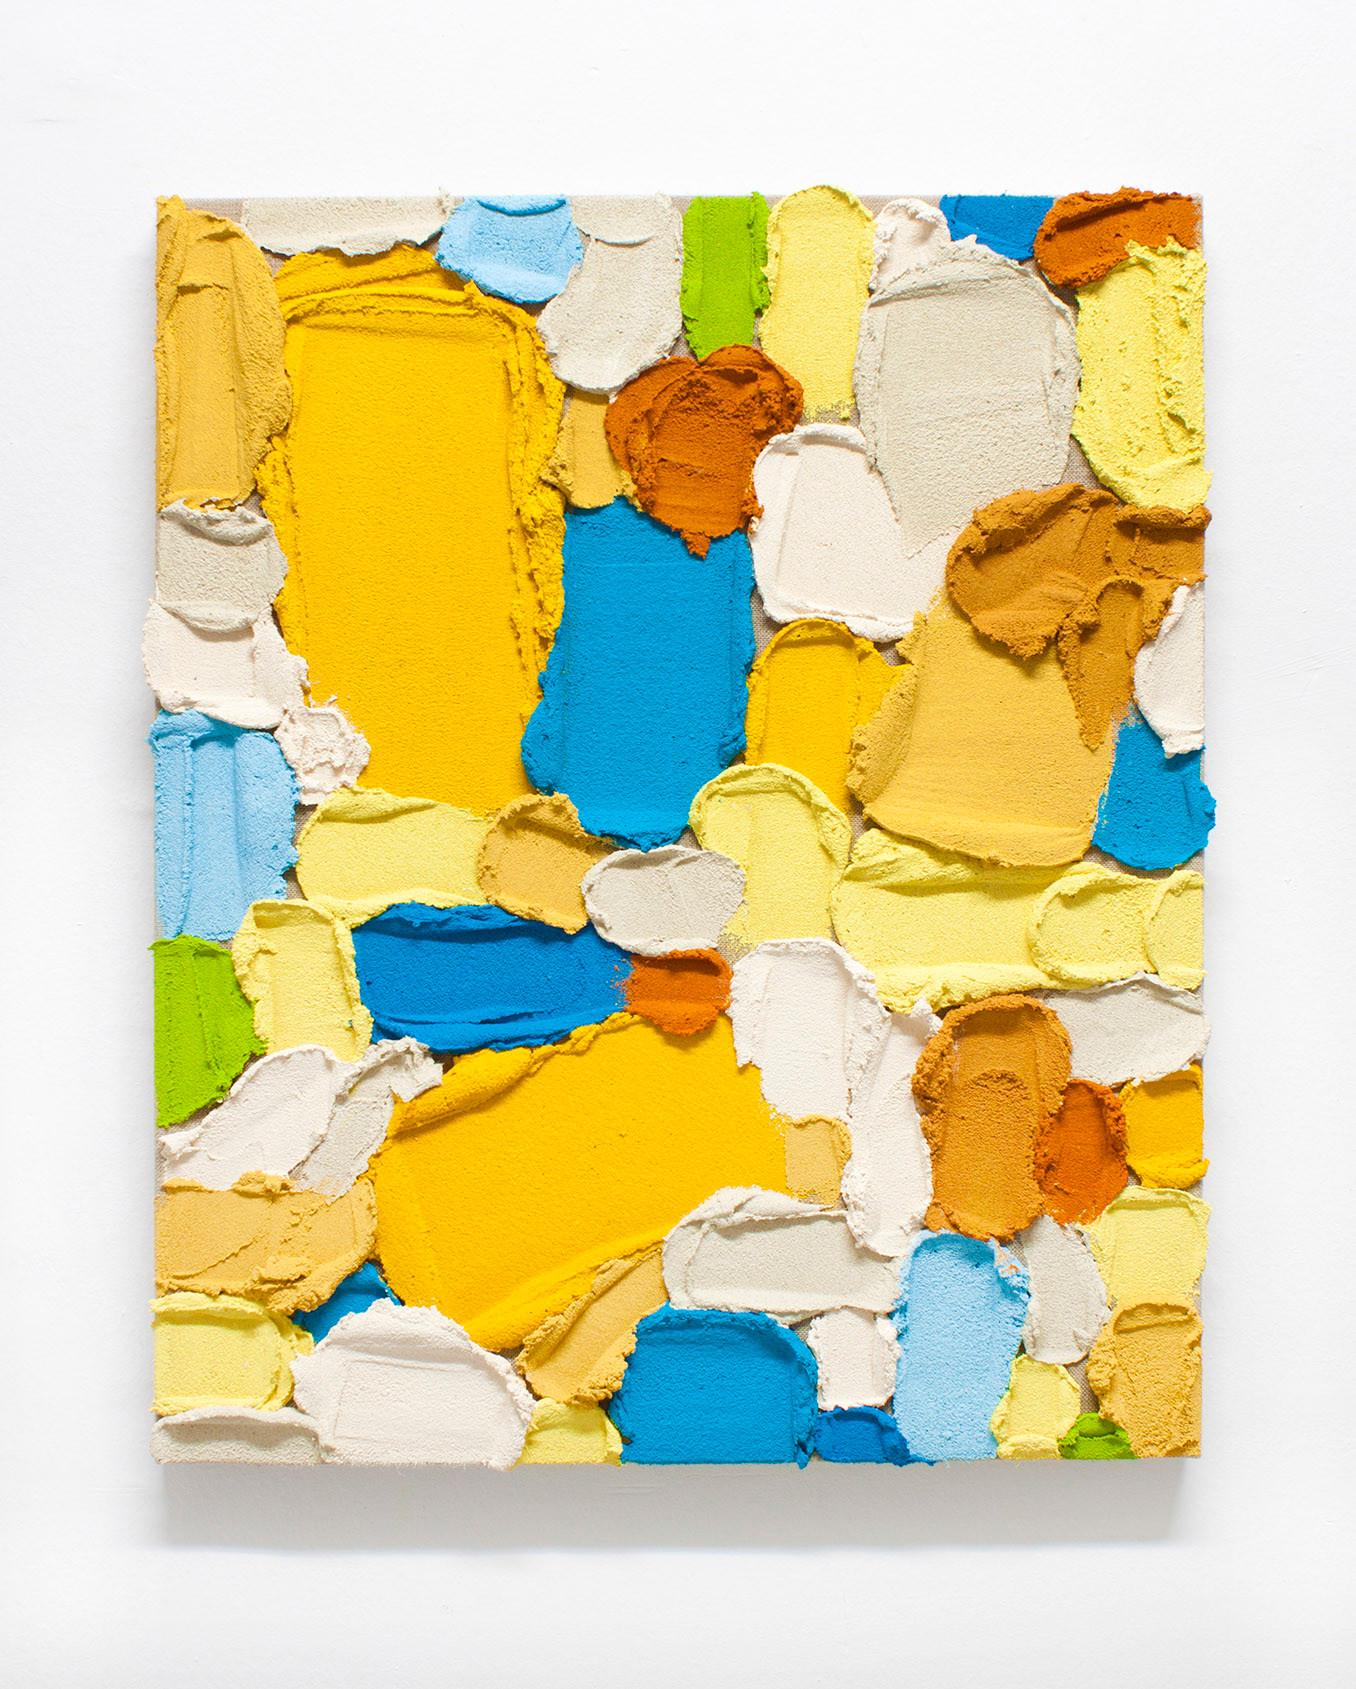 PR39, 2020. Acrylic, sand and limestone on linen. 61 x 50 cm.